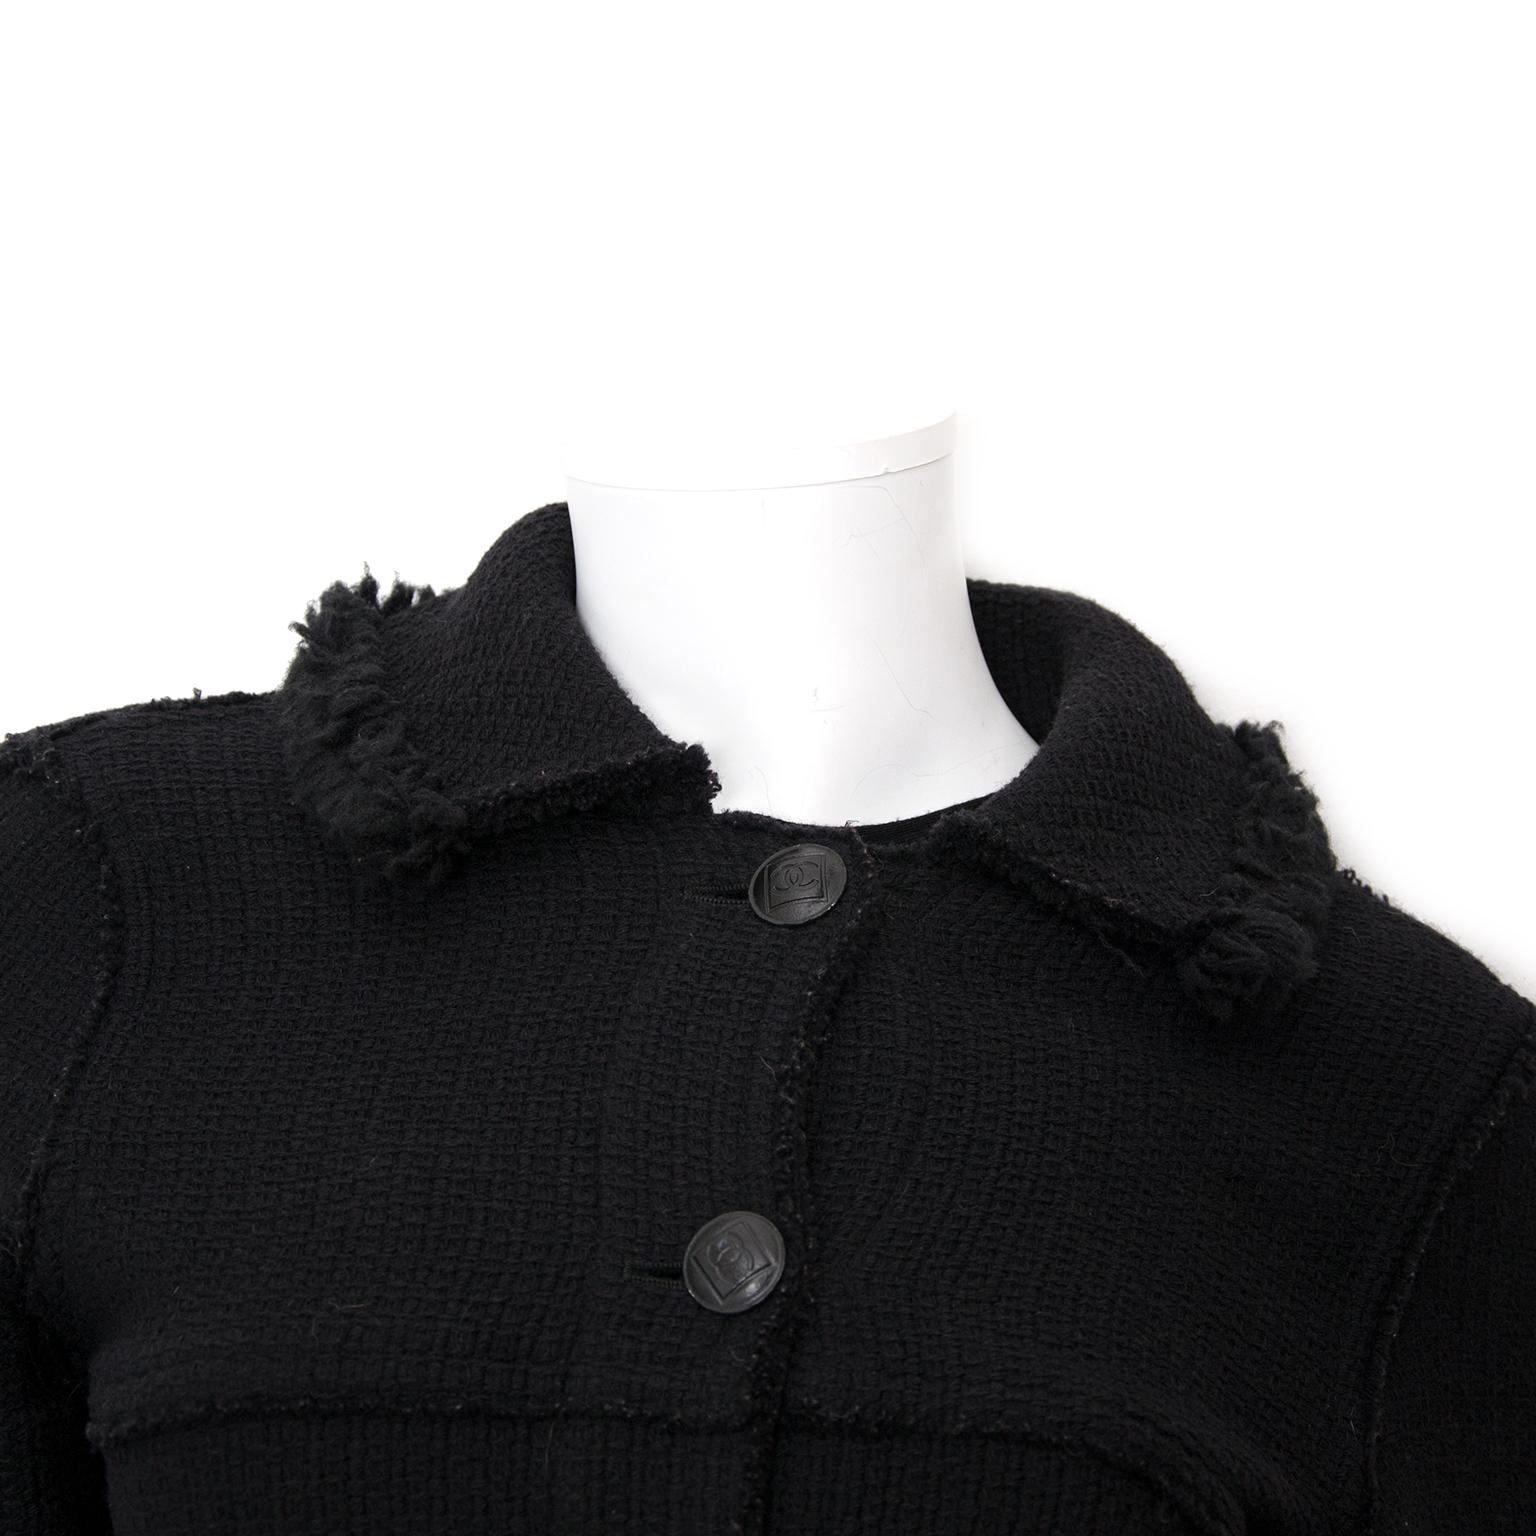 Chanel Black Woolen Blazer - Size 36 now online at labellov.com at the best price.